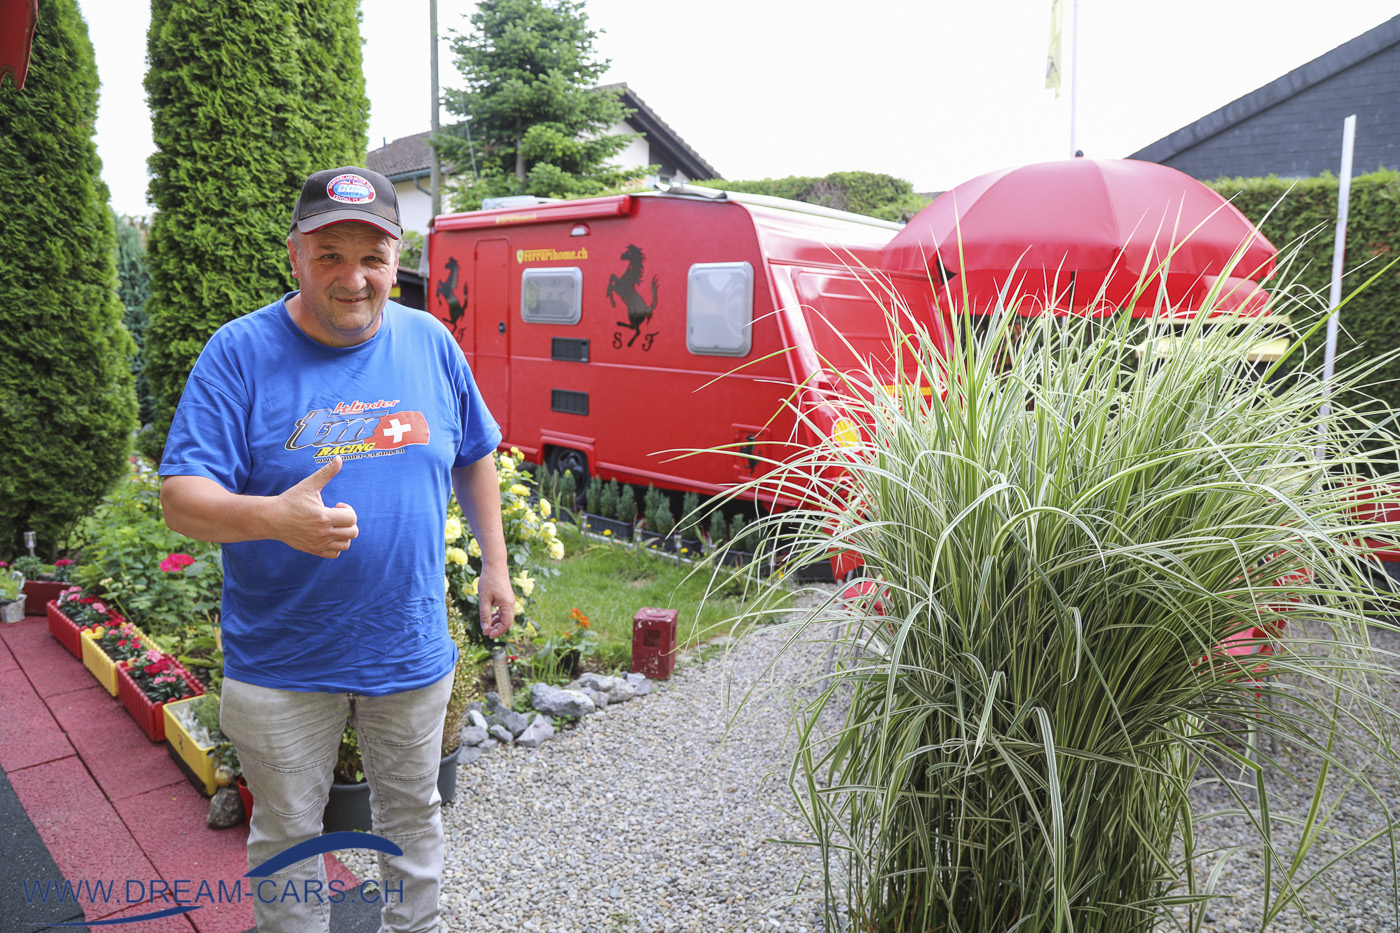 Joe's Ferrarihome Oberbüren, Besuch vom 22.06.2021. Elio Crestani im 'Ferrari-Garten'